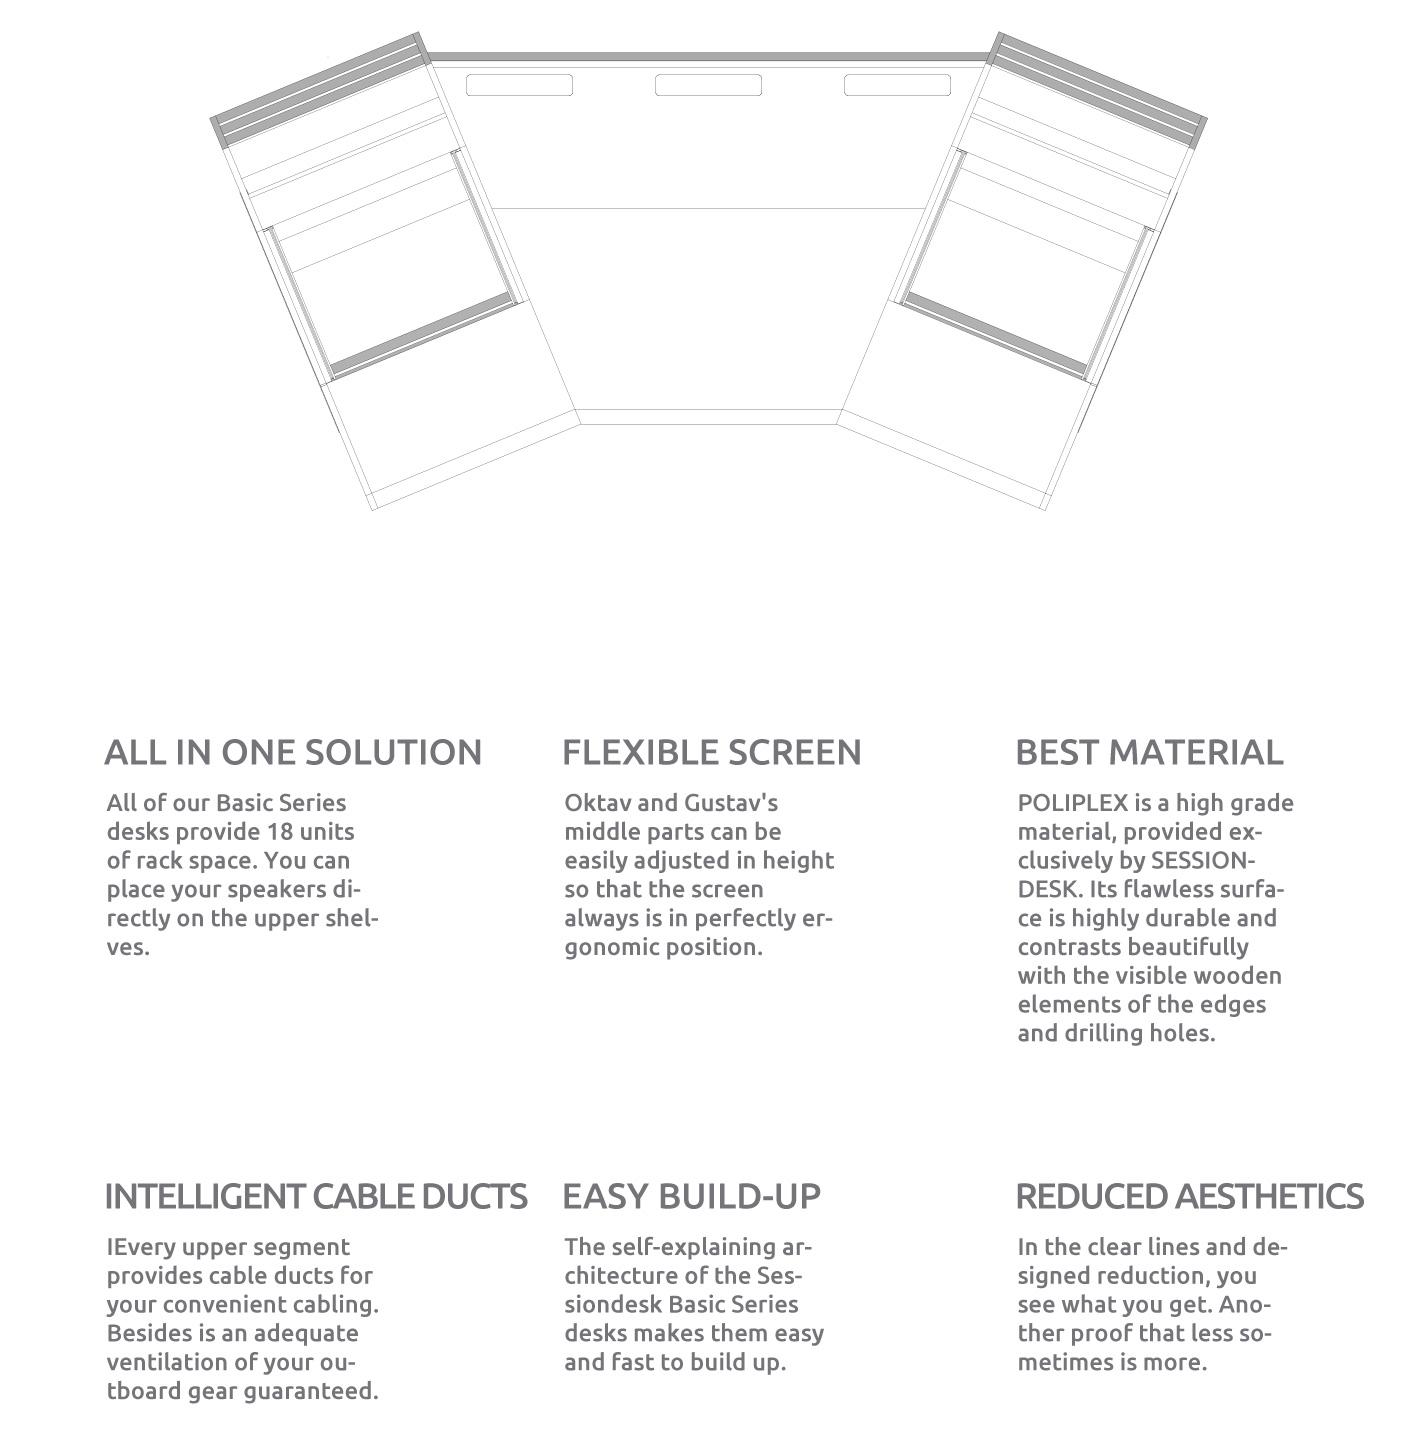 Artnovion product gustav desk 2c9dc232a0